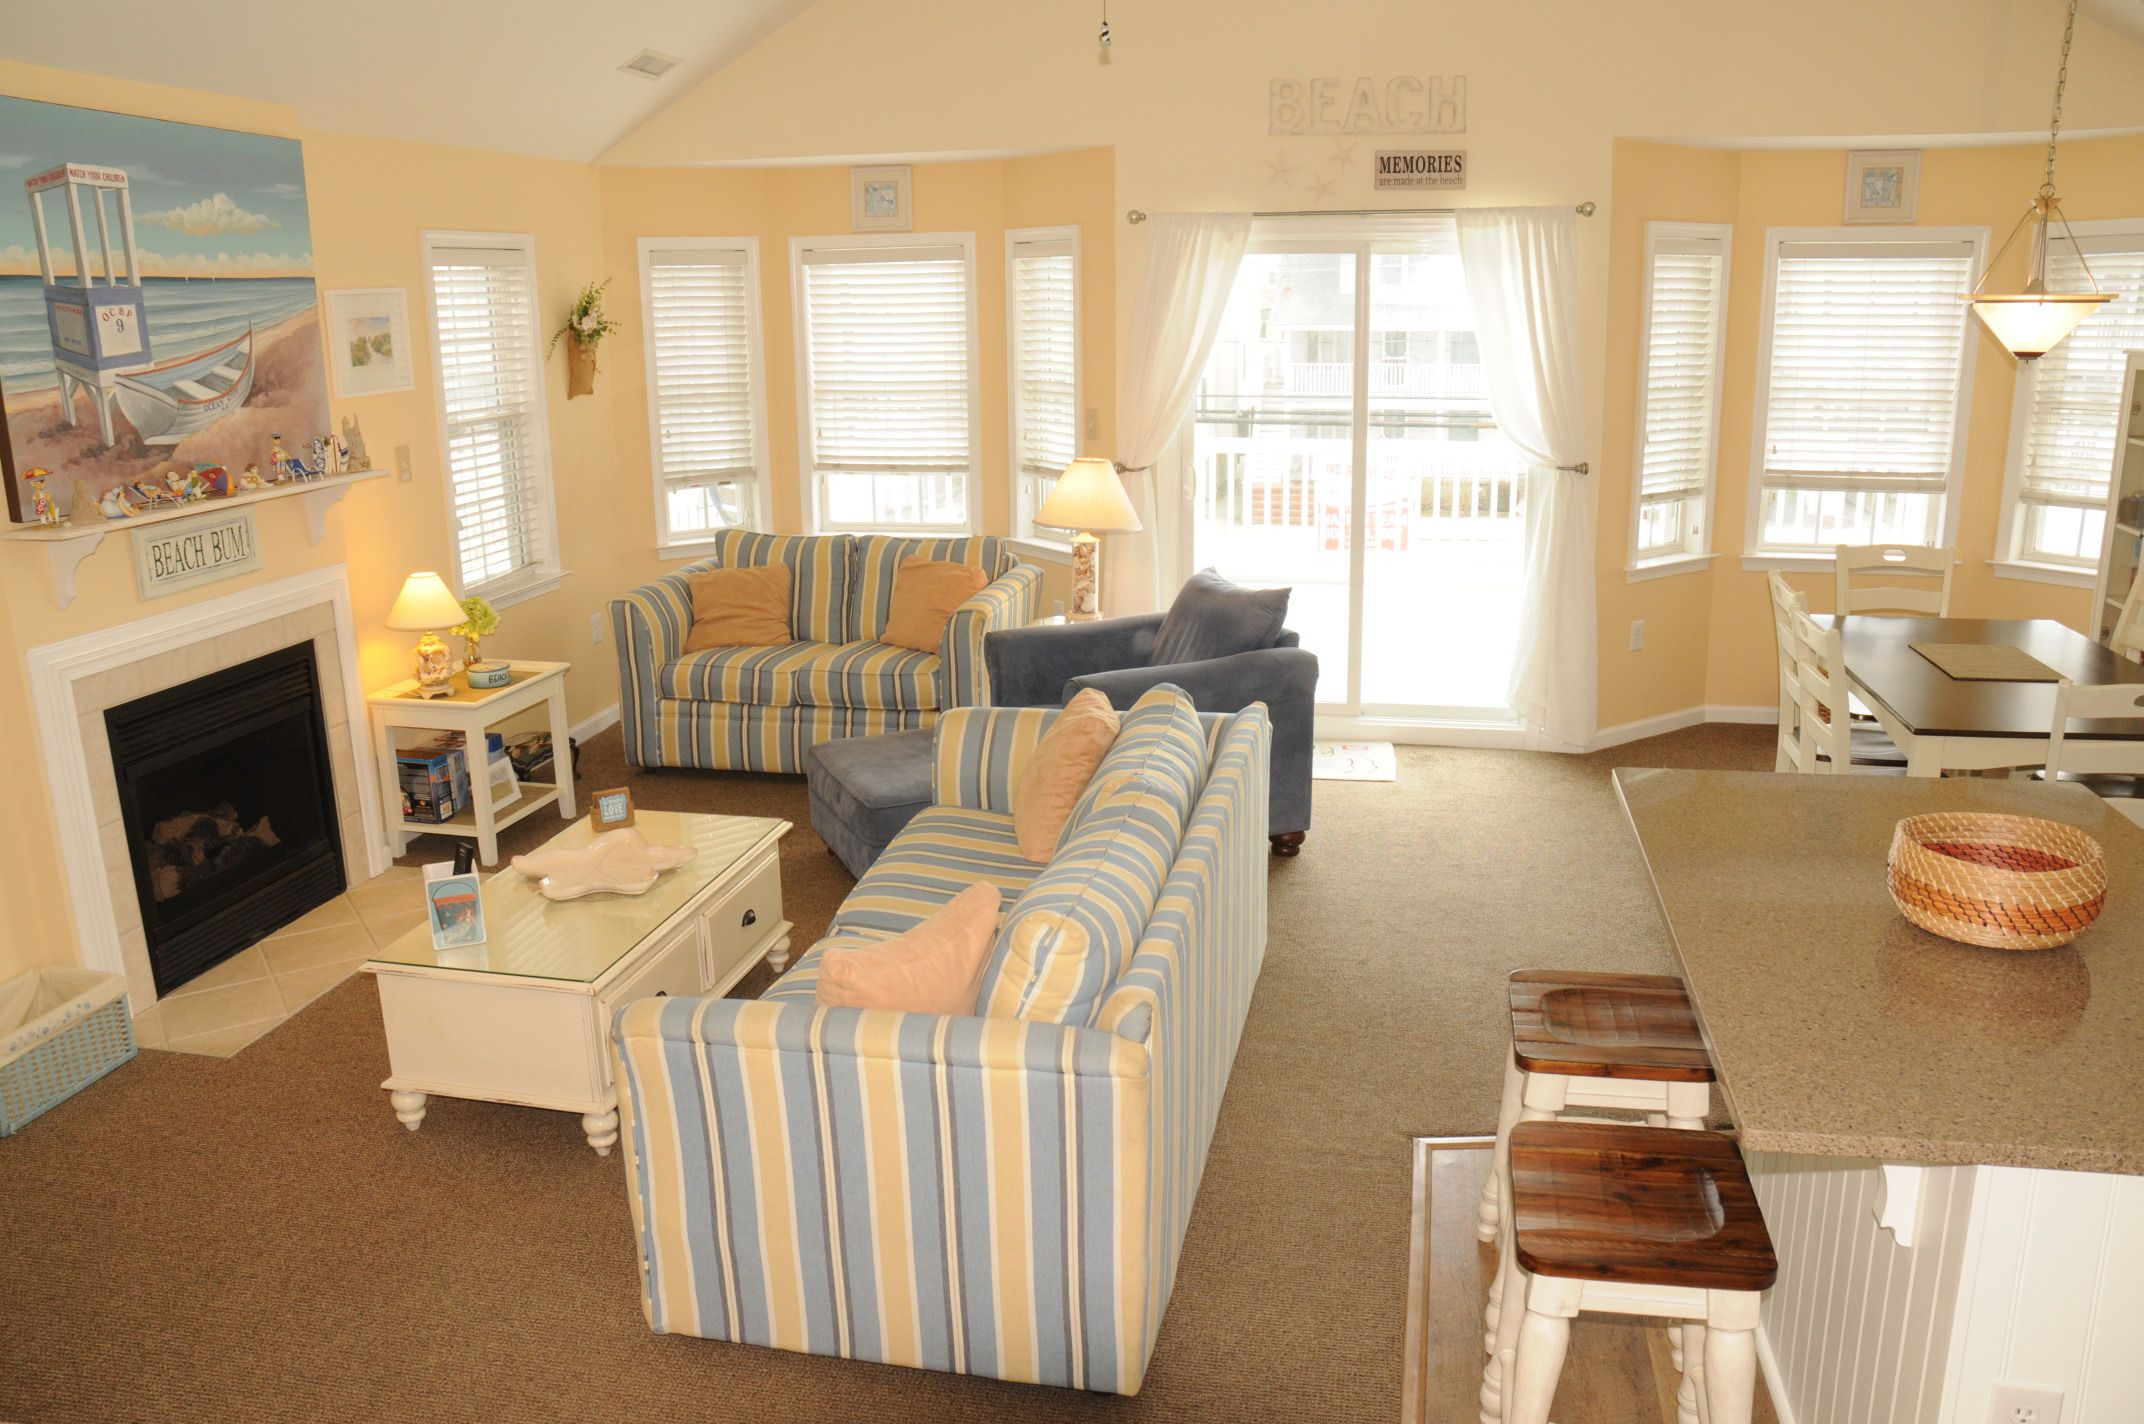 West Ave Ocean City Nj 08226 In 2020 Beach Houses For Sale Rental House